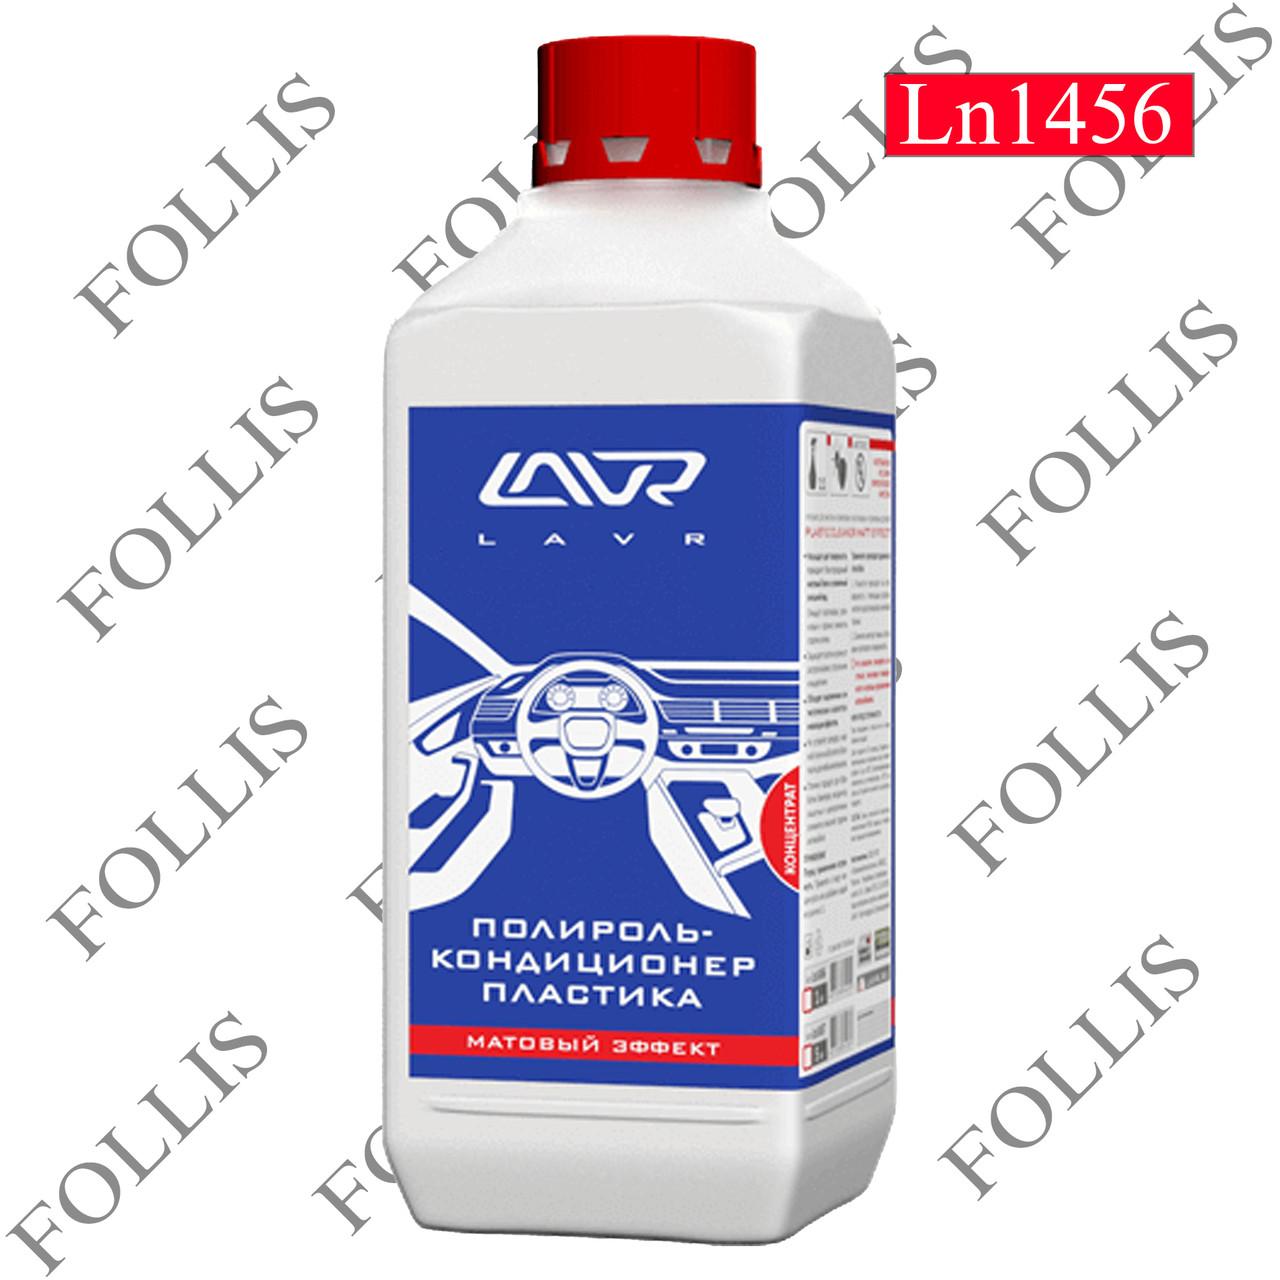 Полироль-кондиционер пластика (концентрат 1:1) LAVR Plastic cleaner matt effect 1л